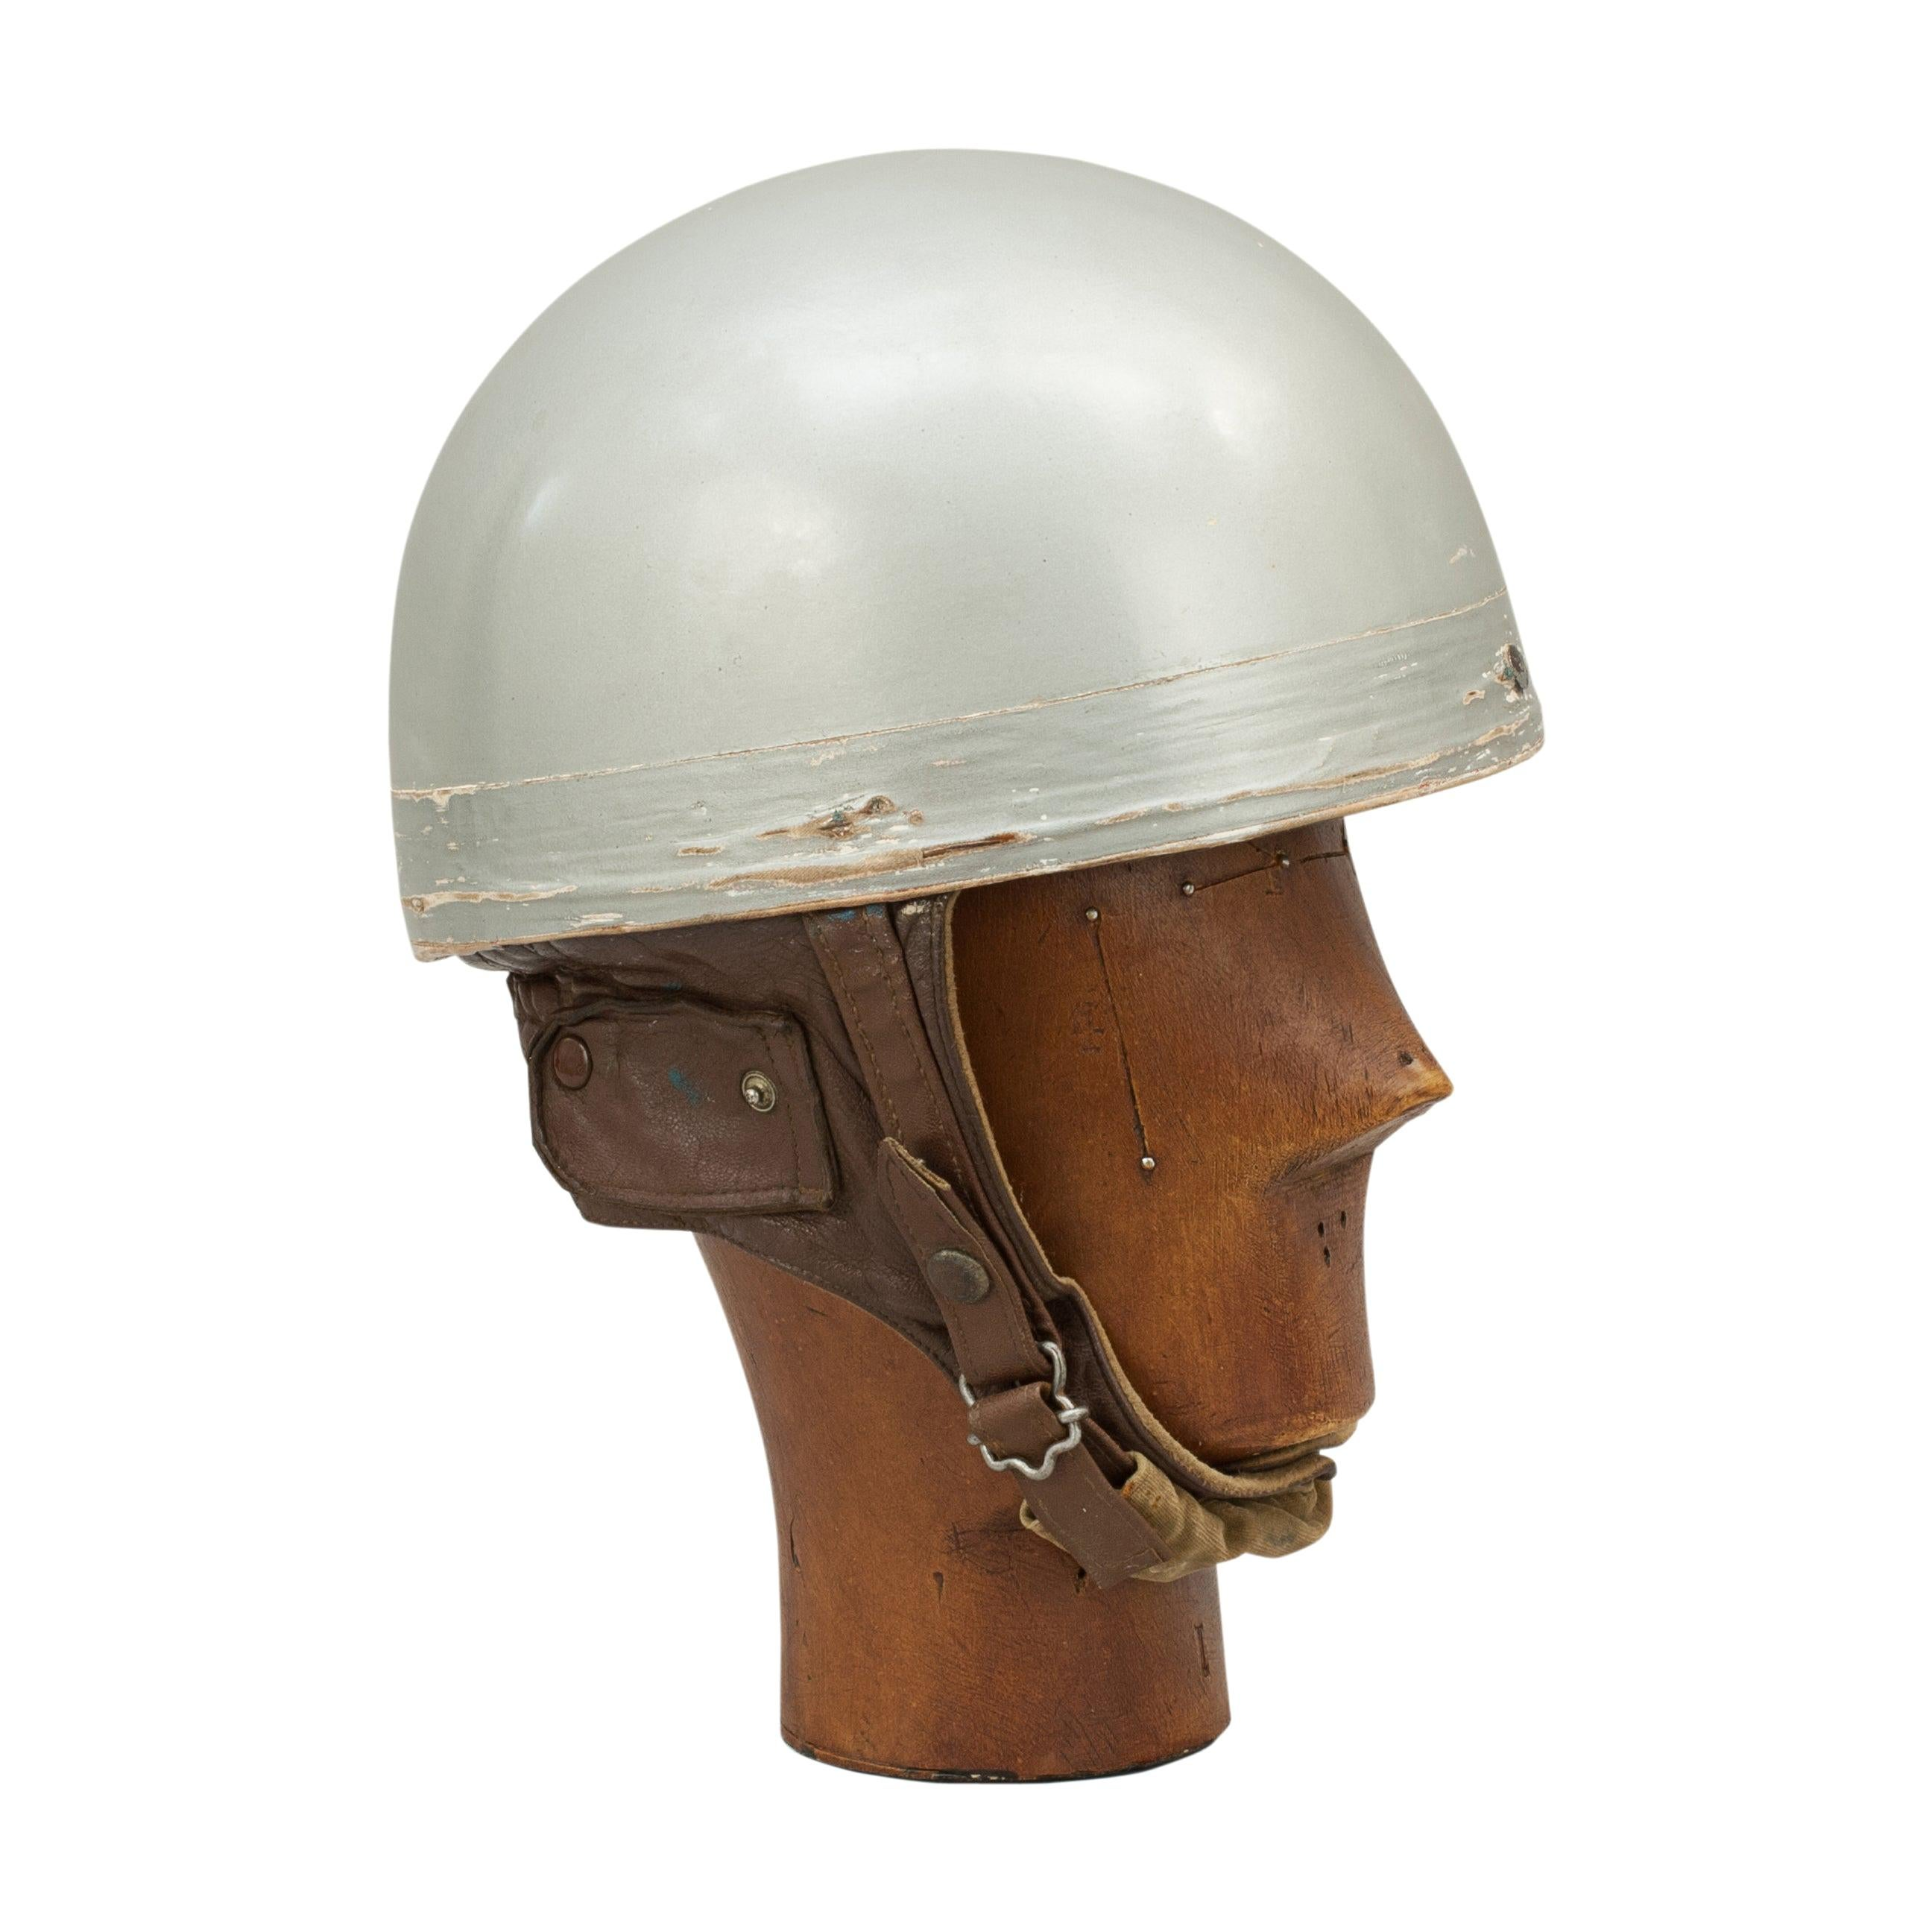 Everoak Motorcycle Helmet, Acu Approved Pudding Basin Helmet